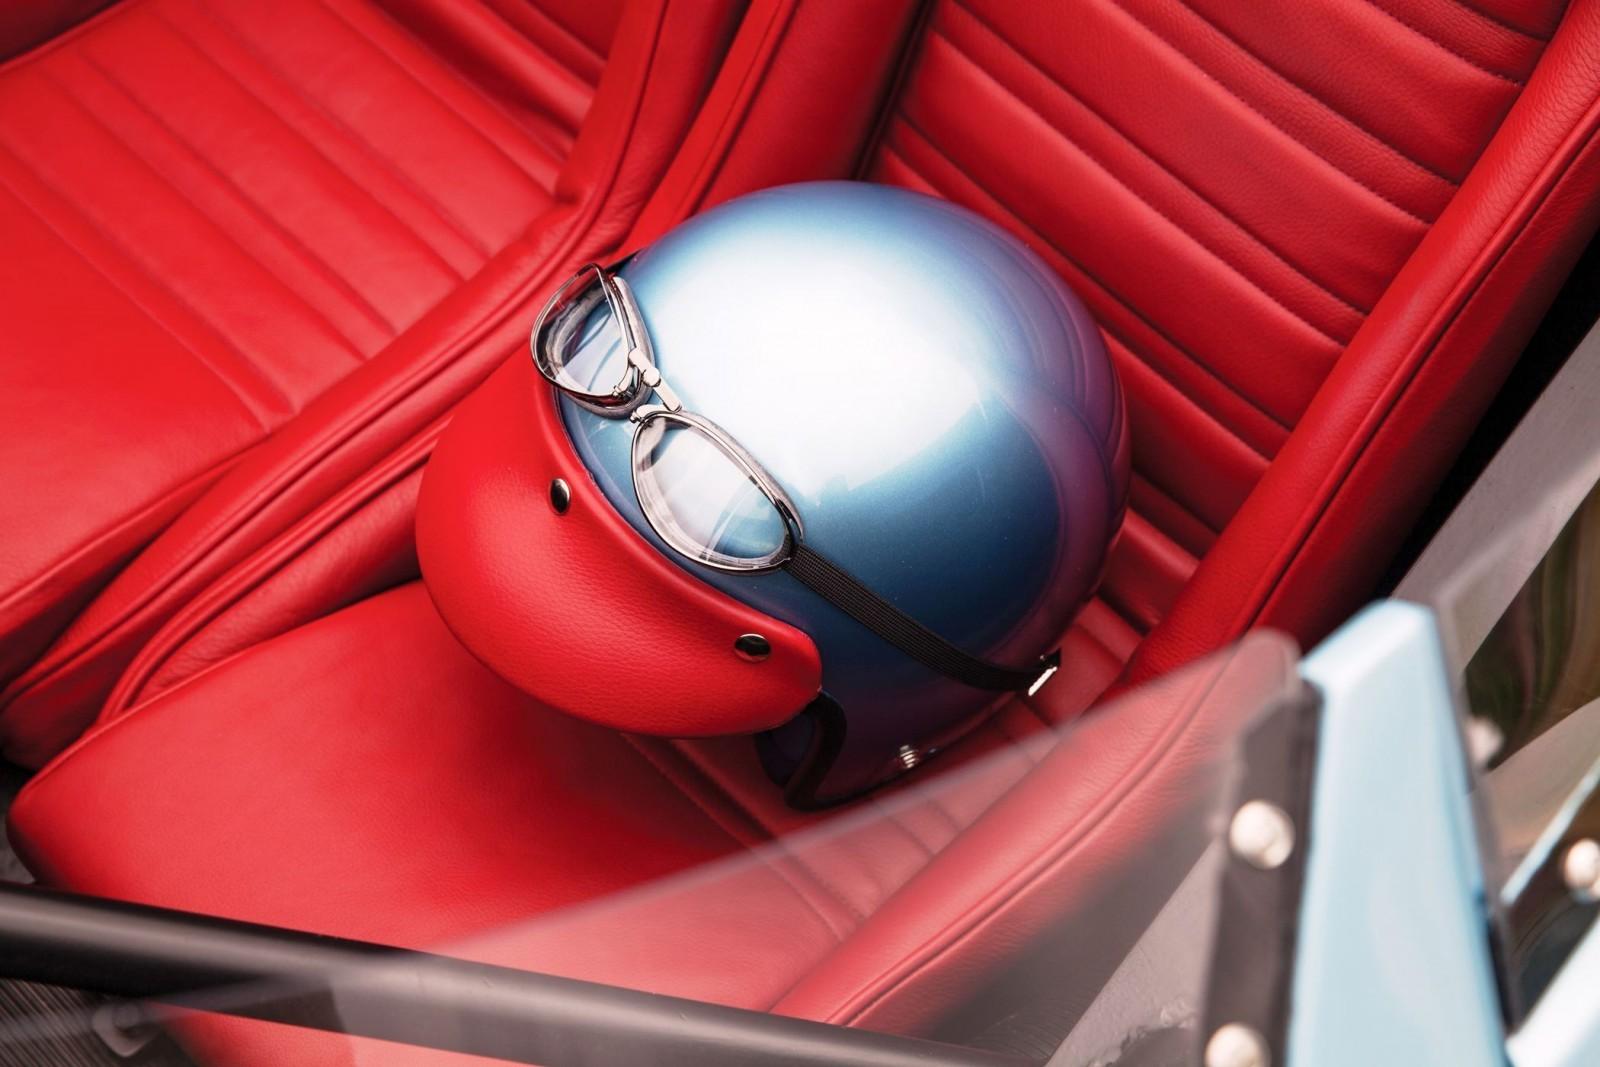 RM Monterey 2015 Preview - 1967 Bizzarrini P538 Speedster